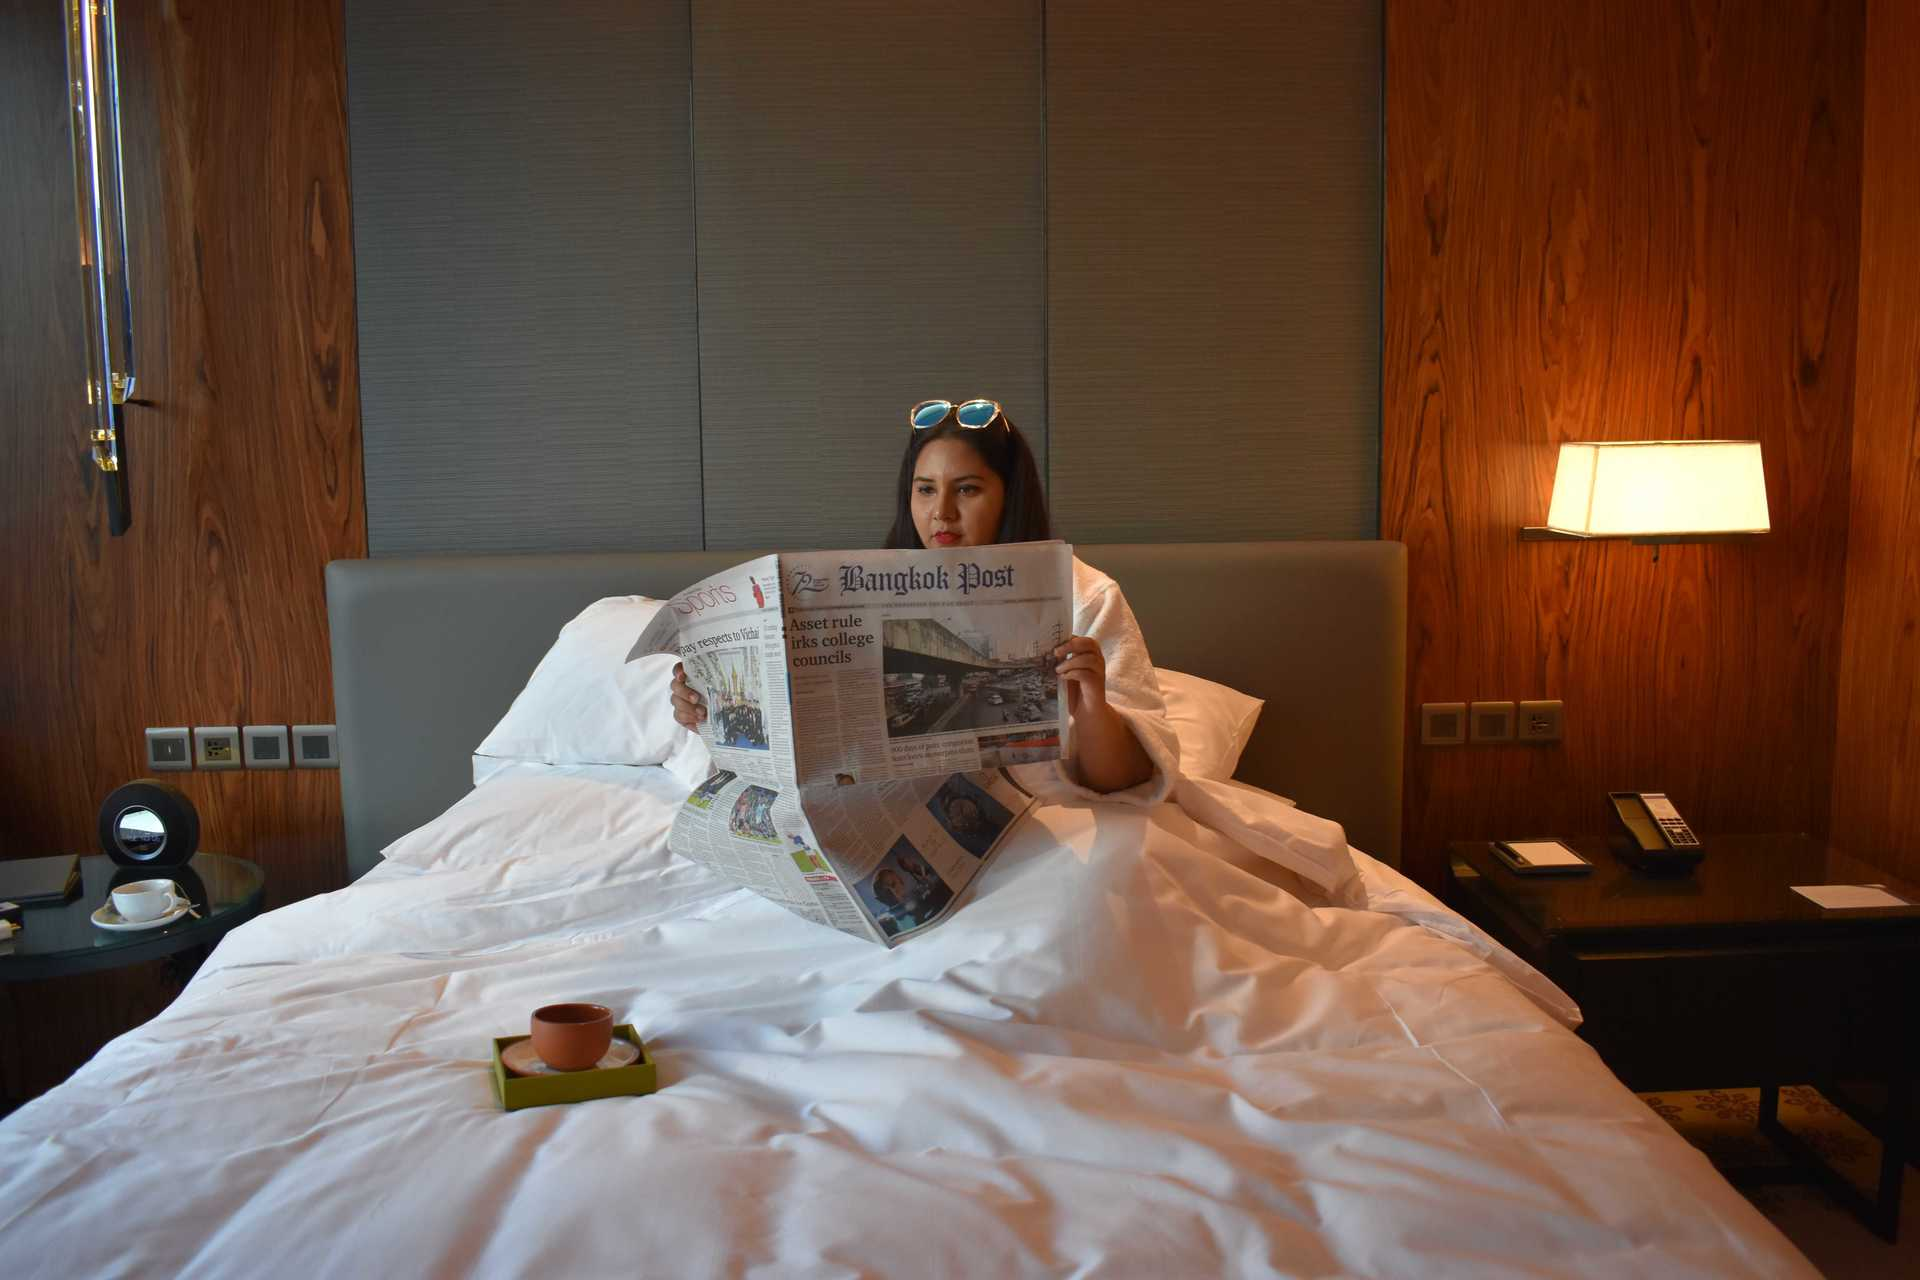 Hyatt Regency Bangkok | Luxury |Thailand image